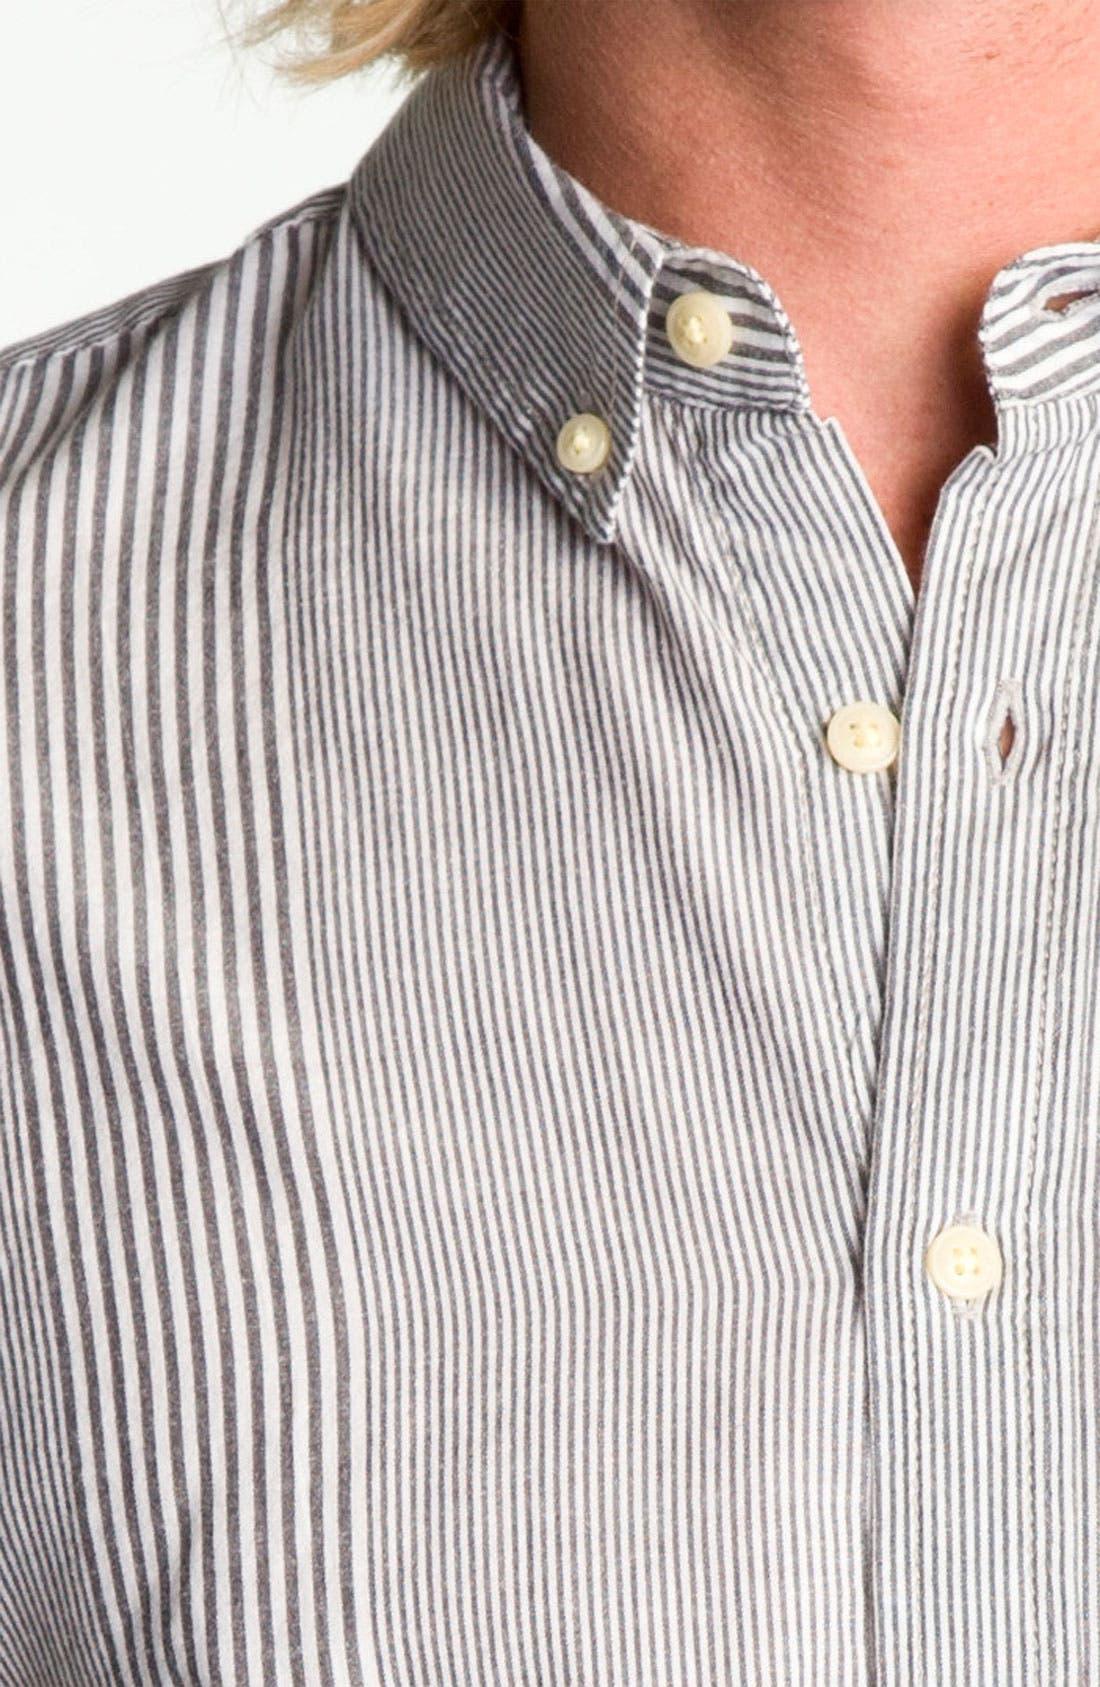 Alternate Image 3  - Obey 'Wayne' Stripe Woven Shirt